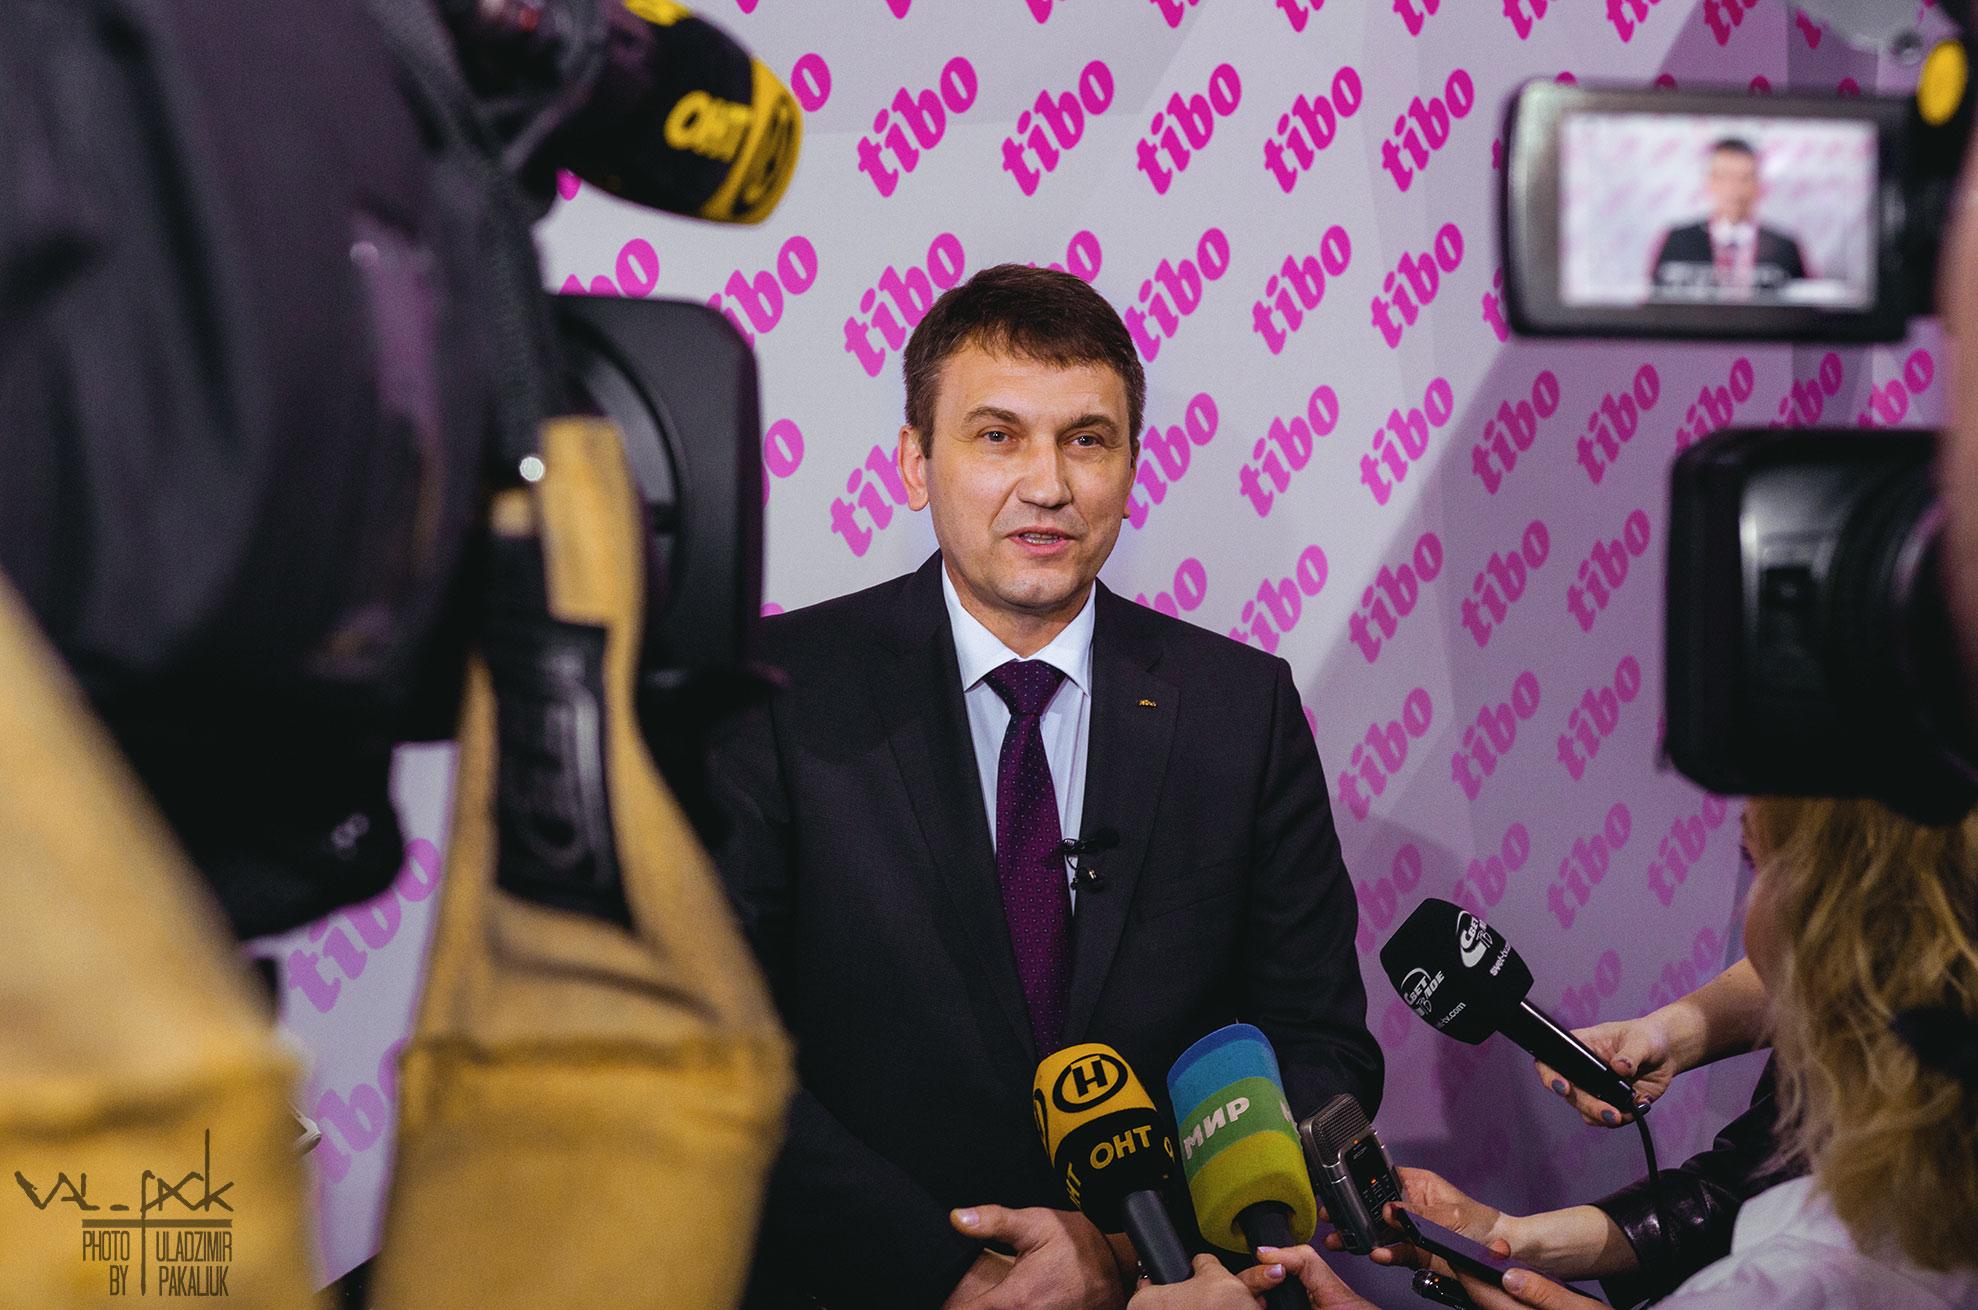 Министр связи и информатизации Республики Беларусь Константин Шульган фотограф Минск